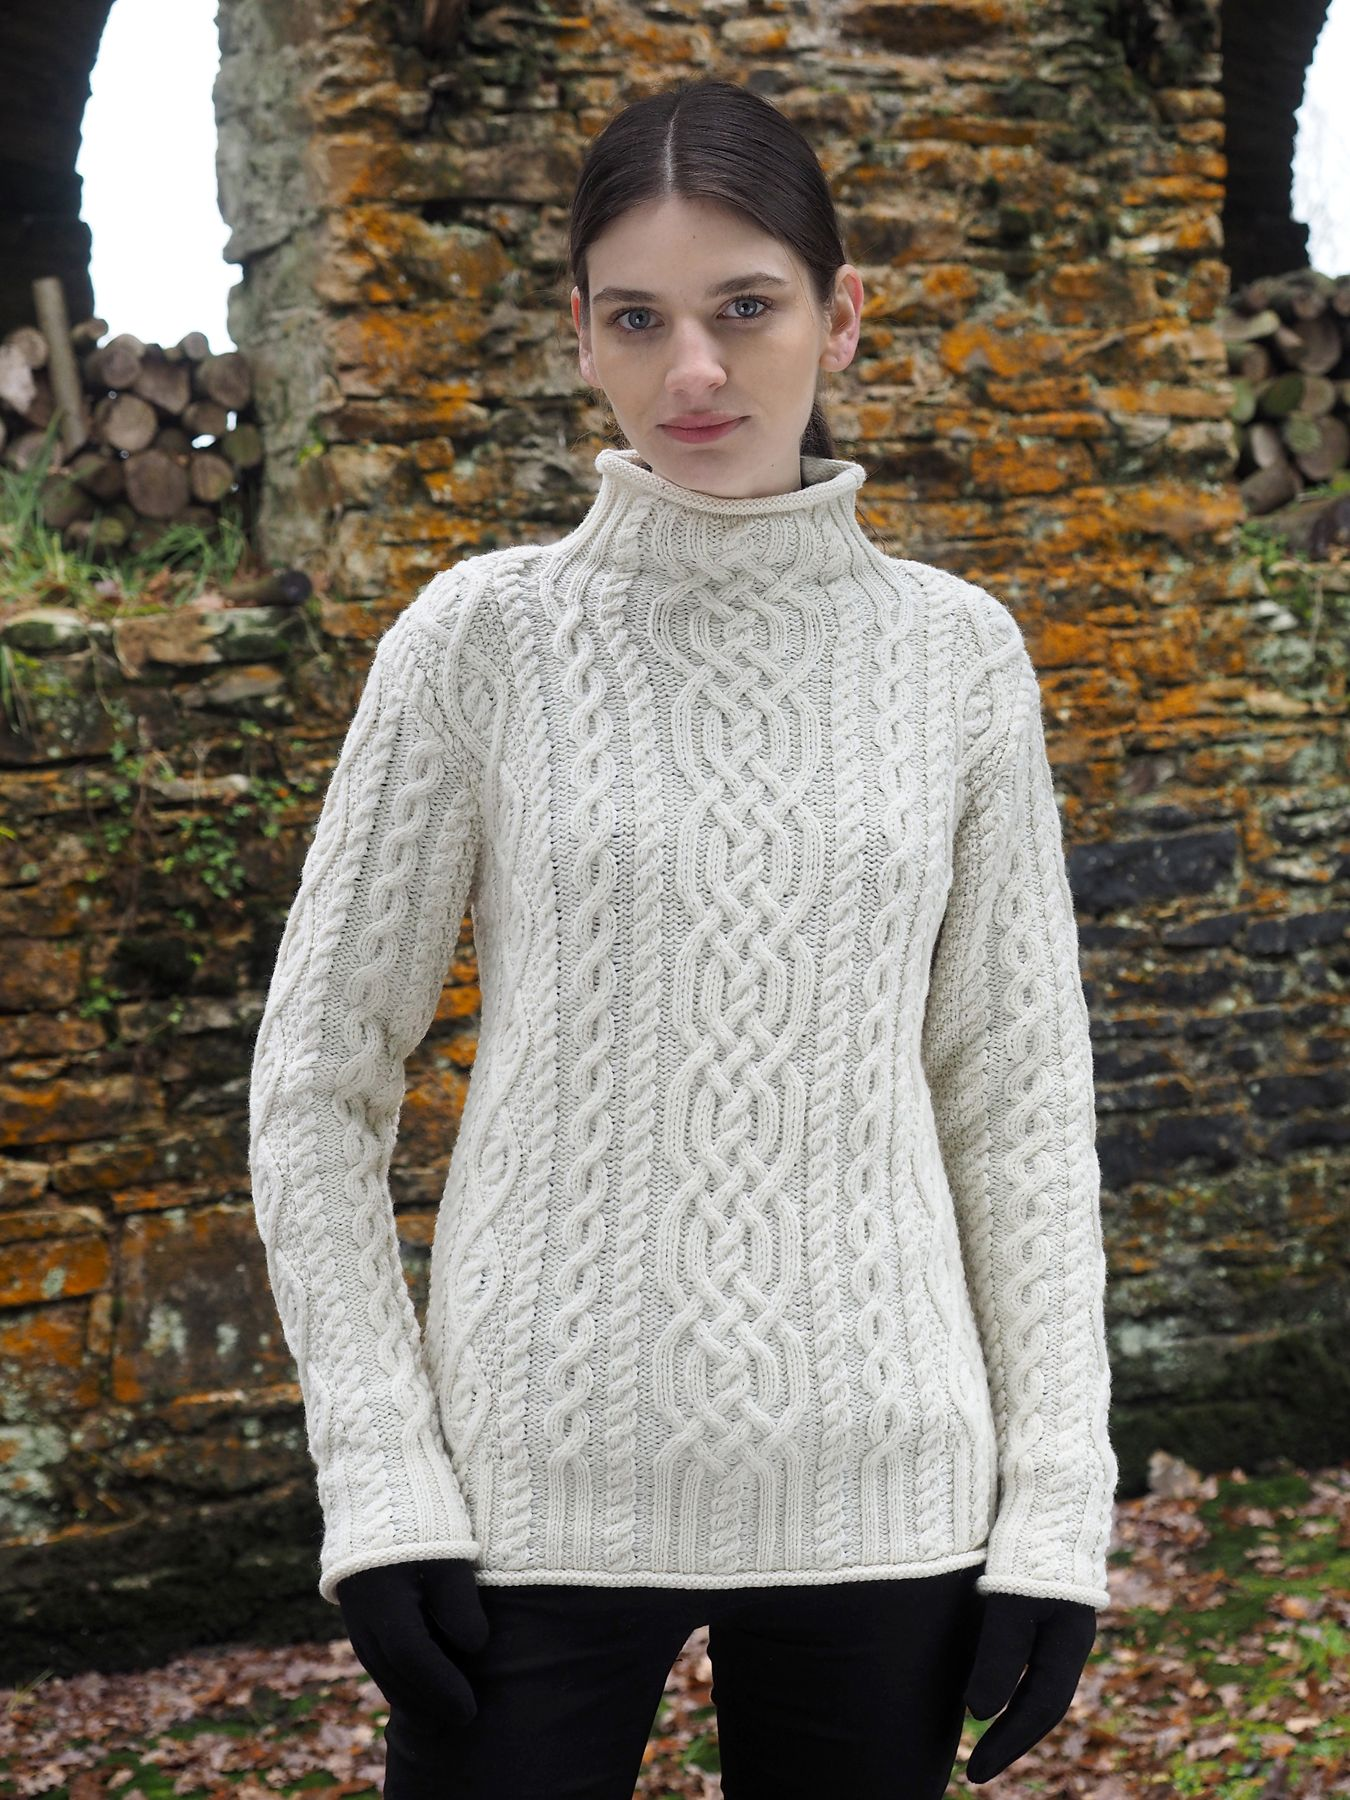 Celtic Ladies Aran Sweater by Natallia Kulikouskaya for AranCrafts ...